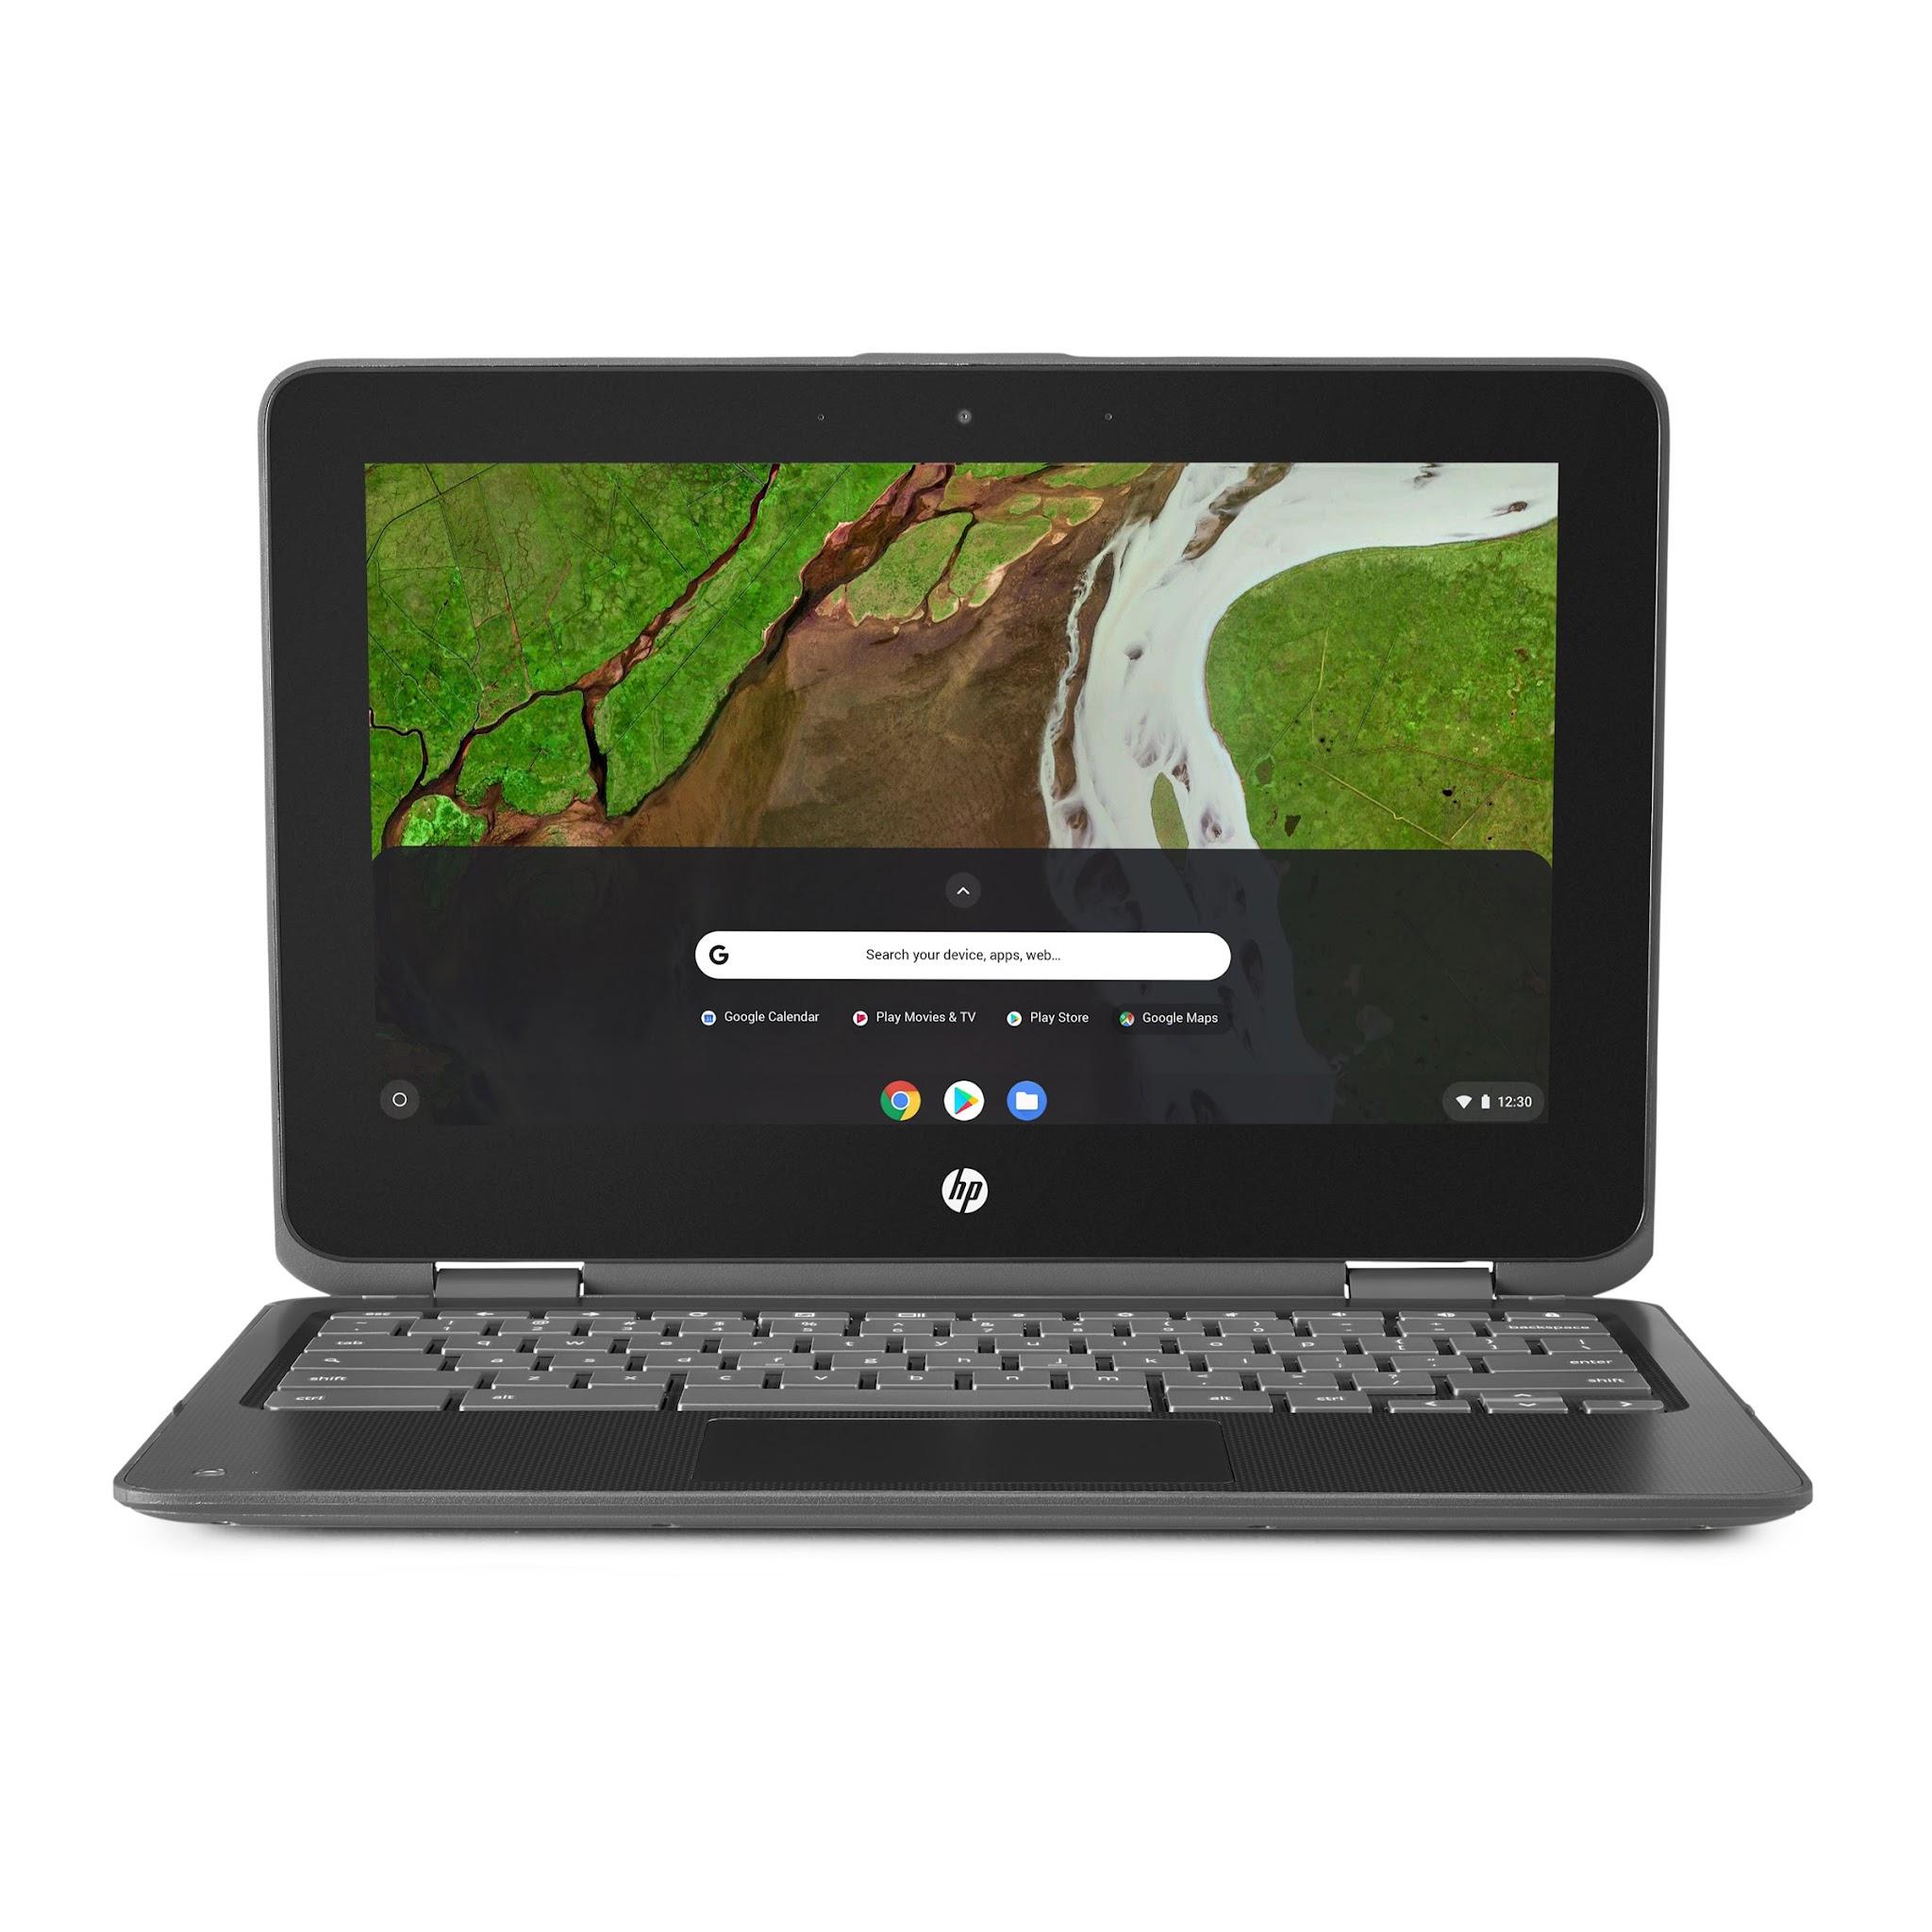 HP Chromebook x360 11 G1 - photo 1